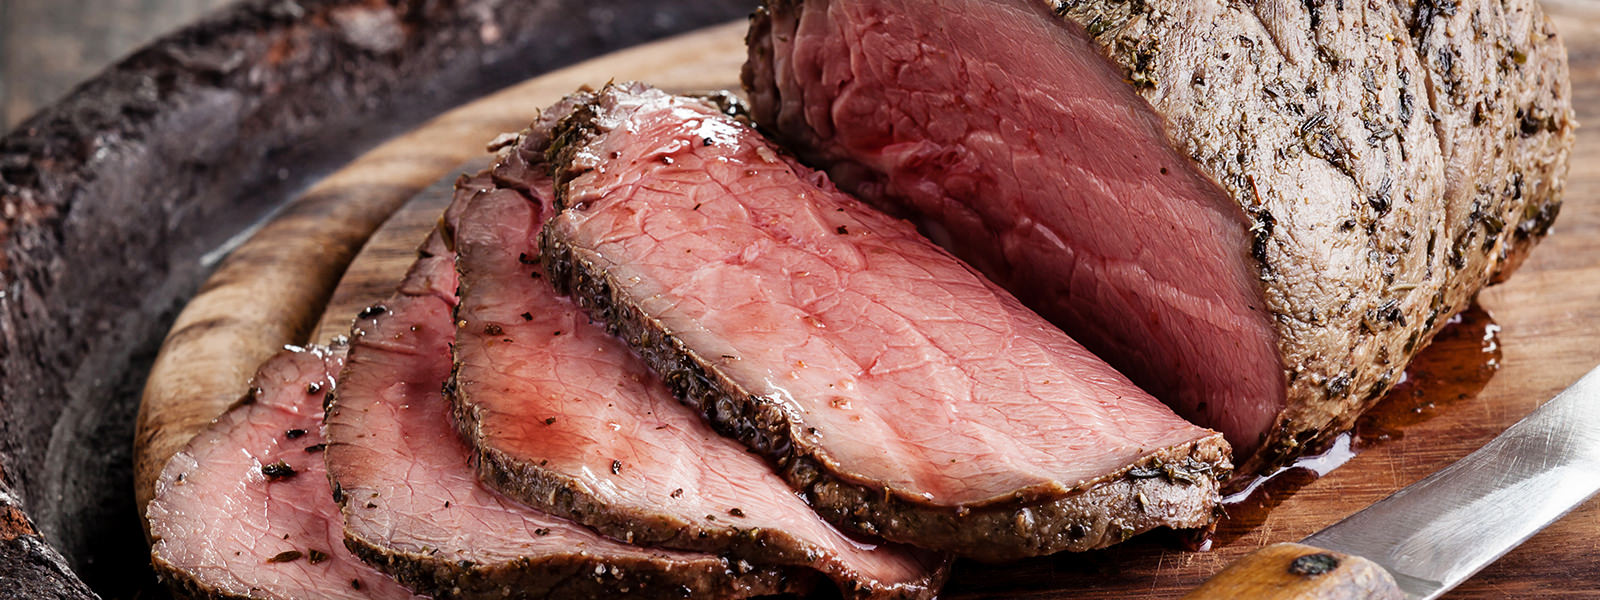 how to cook striploin roast beef